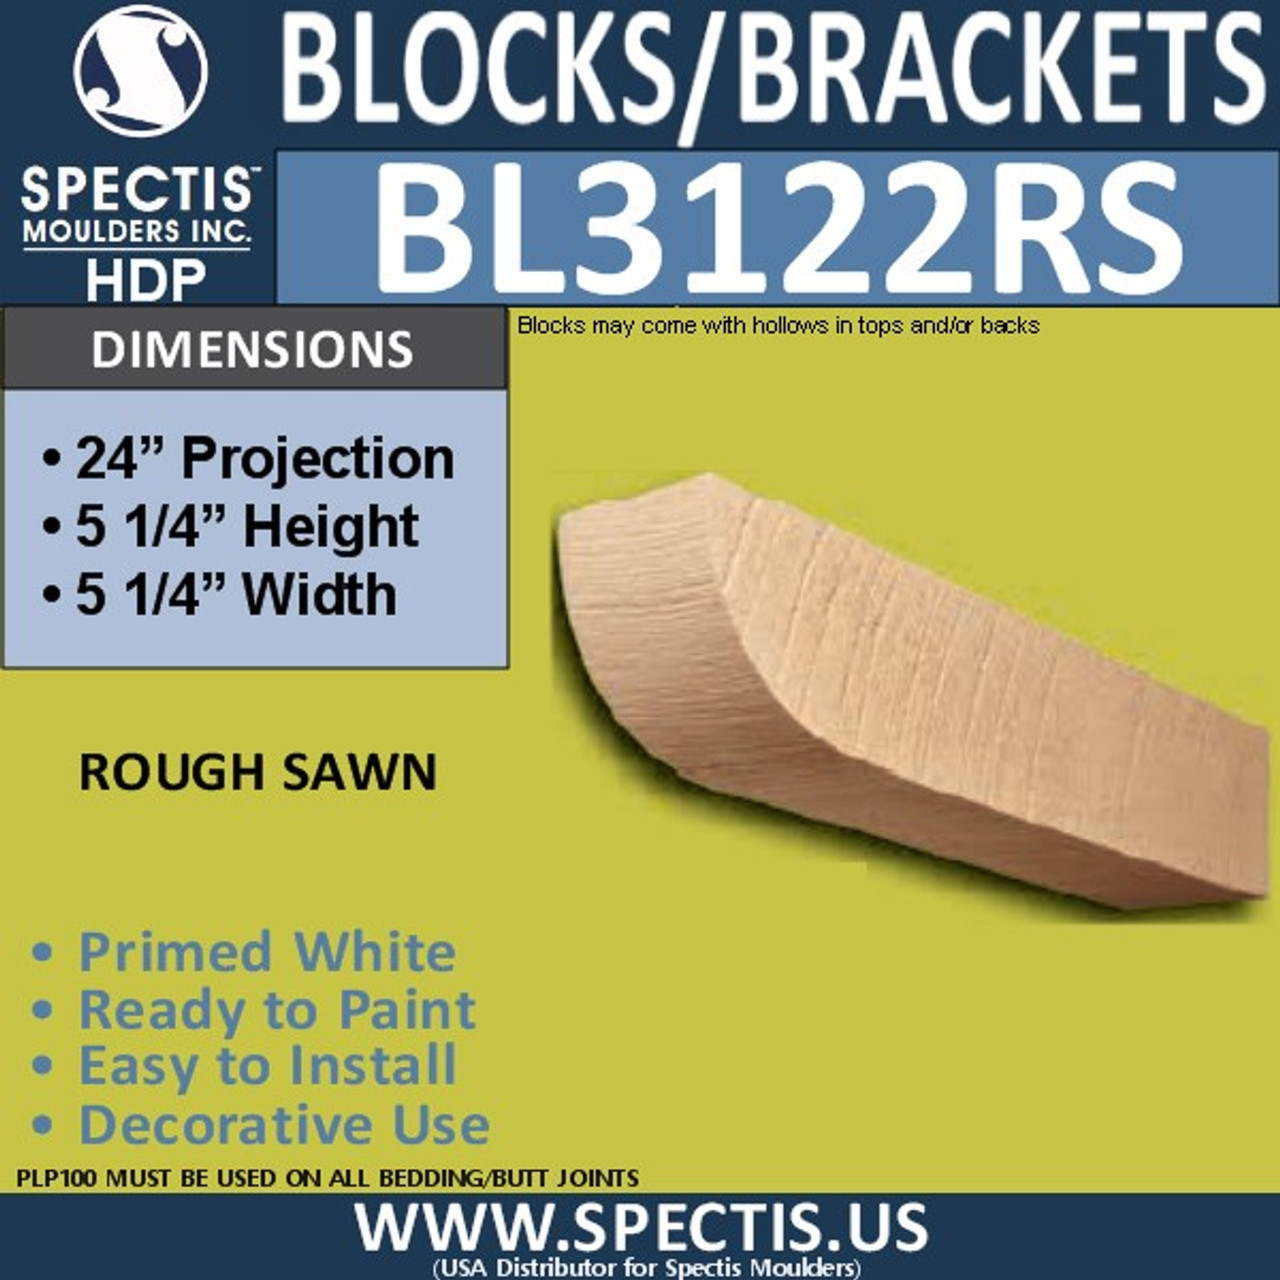 "BL3122RS Rough Sawn Eave Block or Bracket 5.25""W x 5.25""H x 24""P"